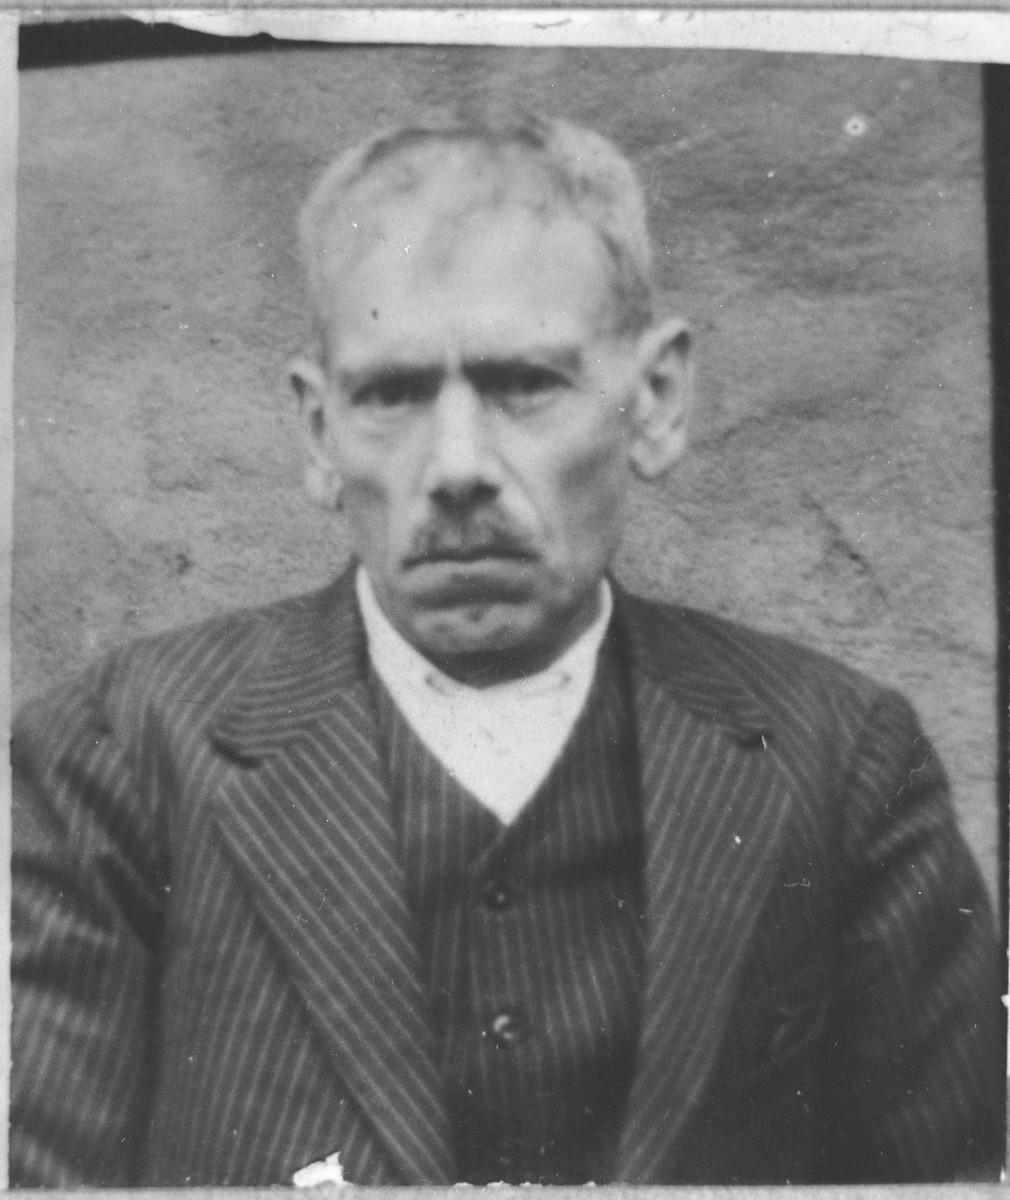 Portrait of Mati Levi.  He was a milkman.  He lived at Ferizovatska 30 in Bitola.